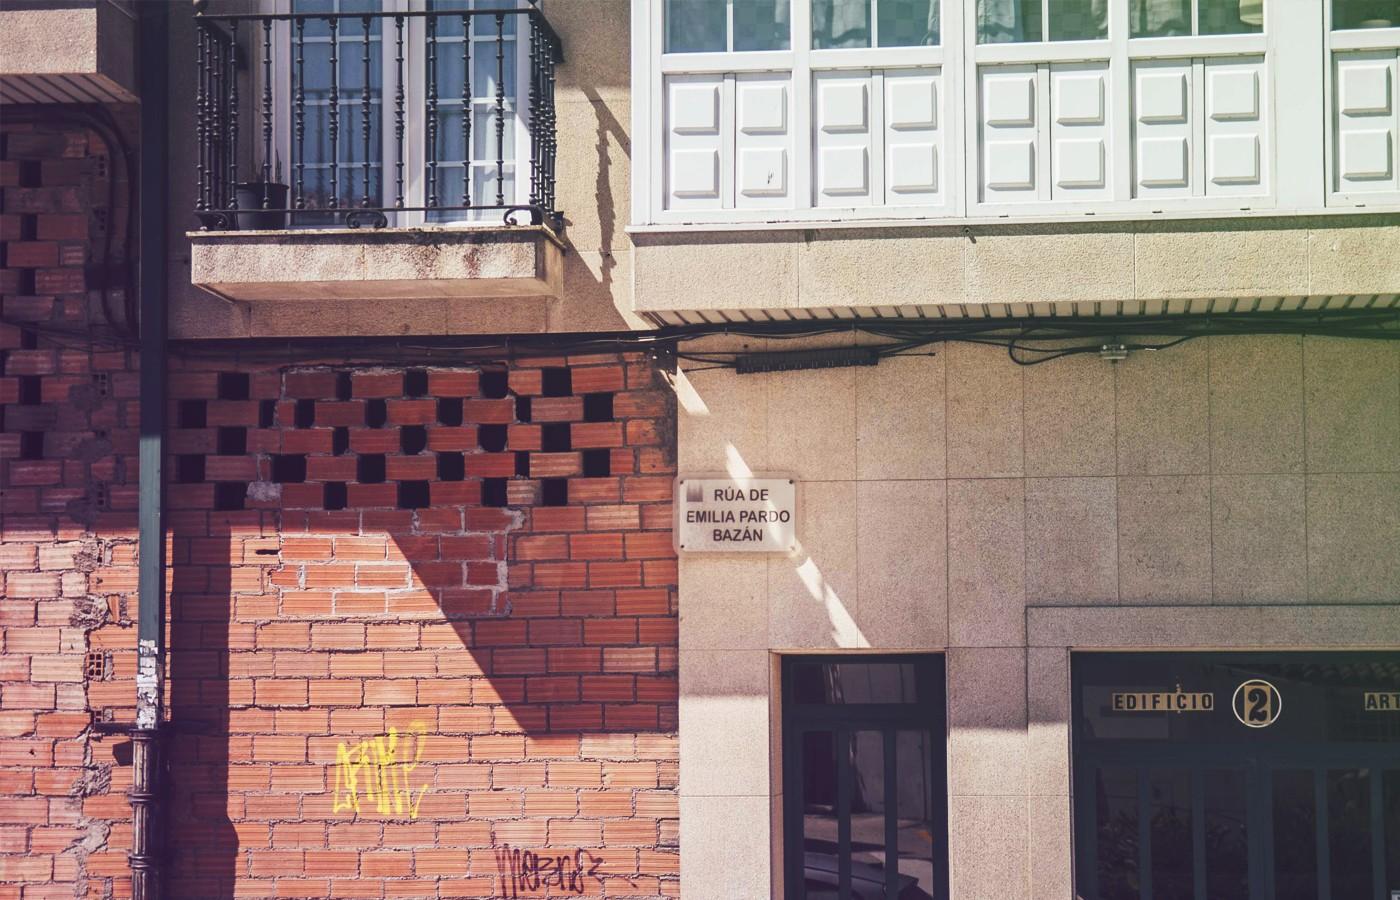 tm_compostela_toponimia_urbana_04